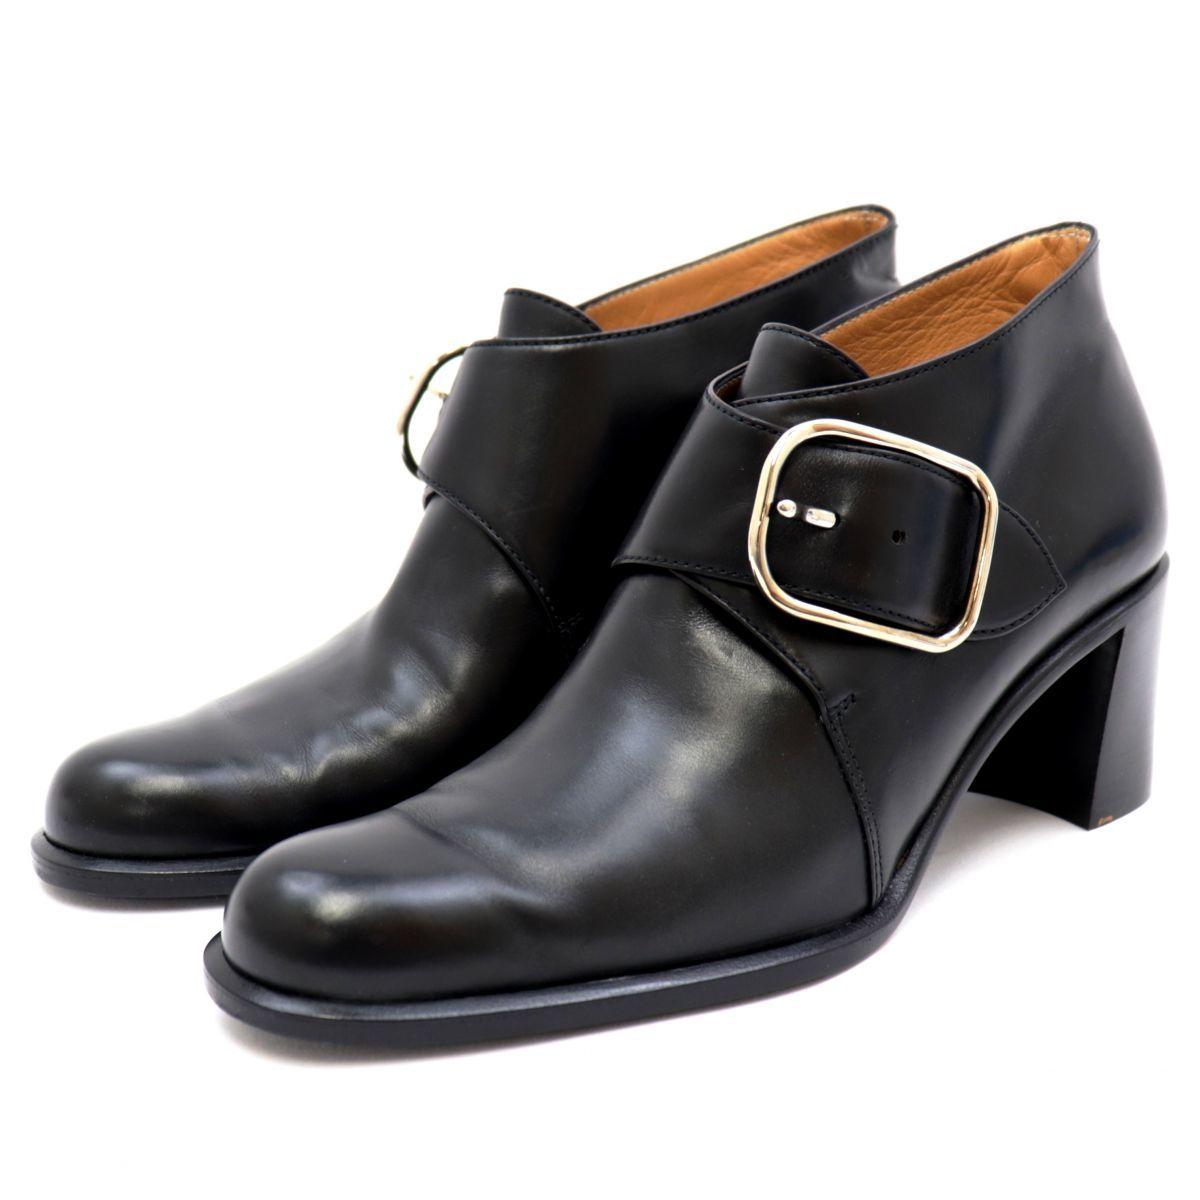 Hermes Strap Leather Heel Short Boots Women's Black 36.5 Silver Buckle